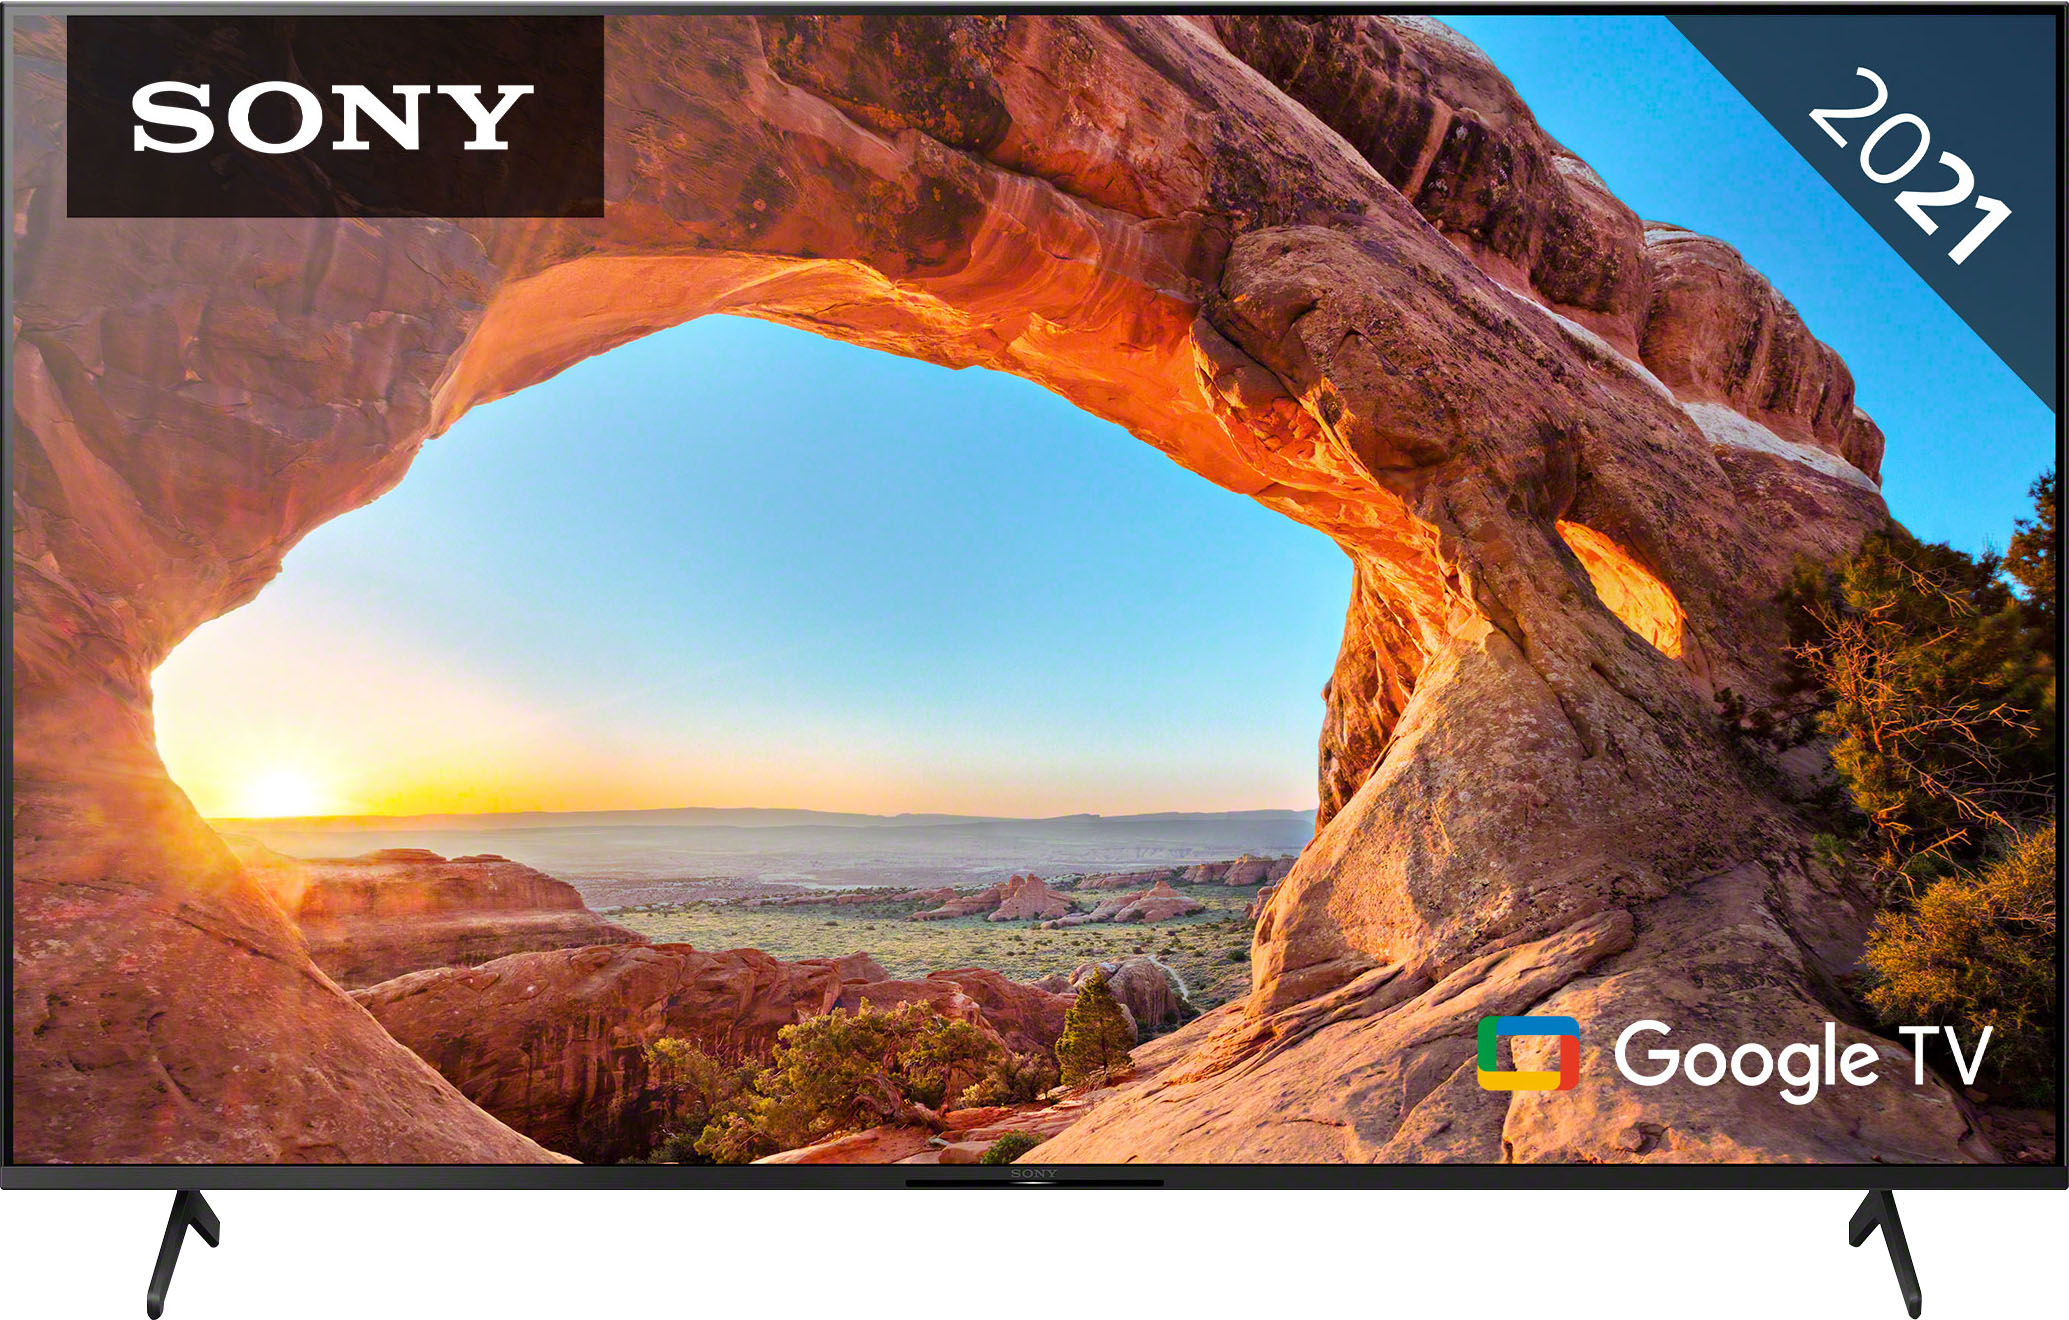 Sony LCD-LED Fernseher KD-75X85J , 189 cm 75 , 4K Ultra HD, Smart-TV, Smart TV